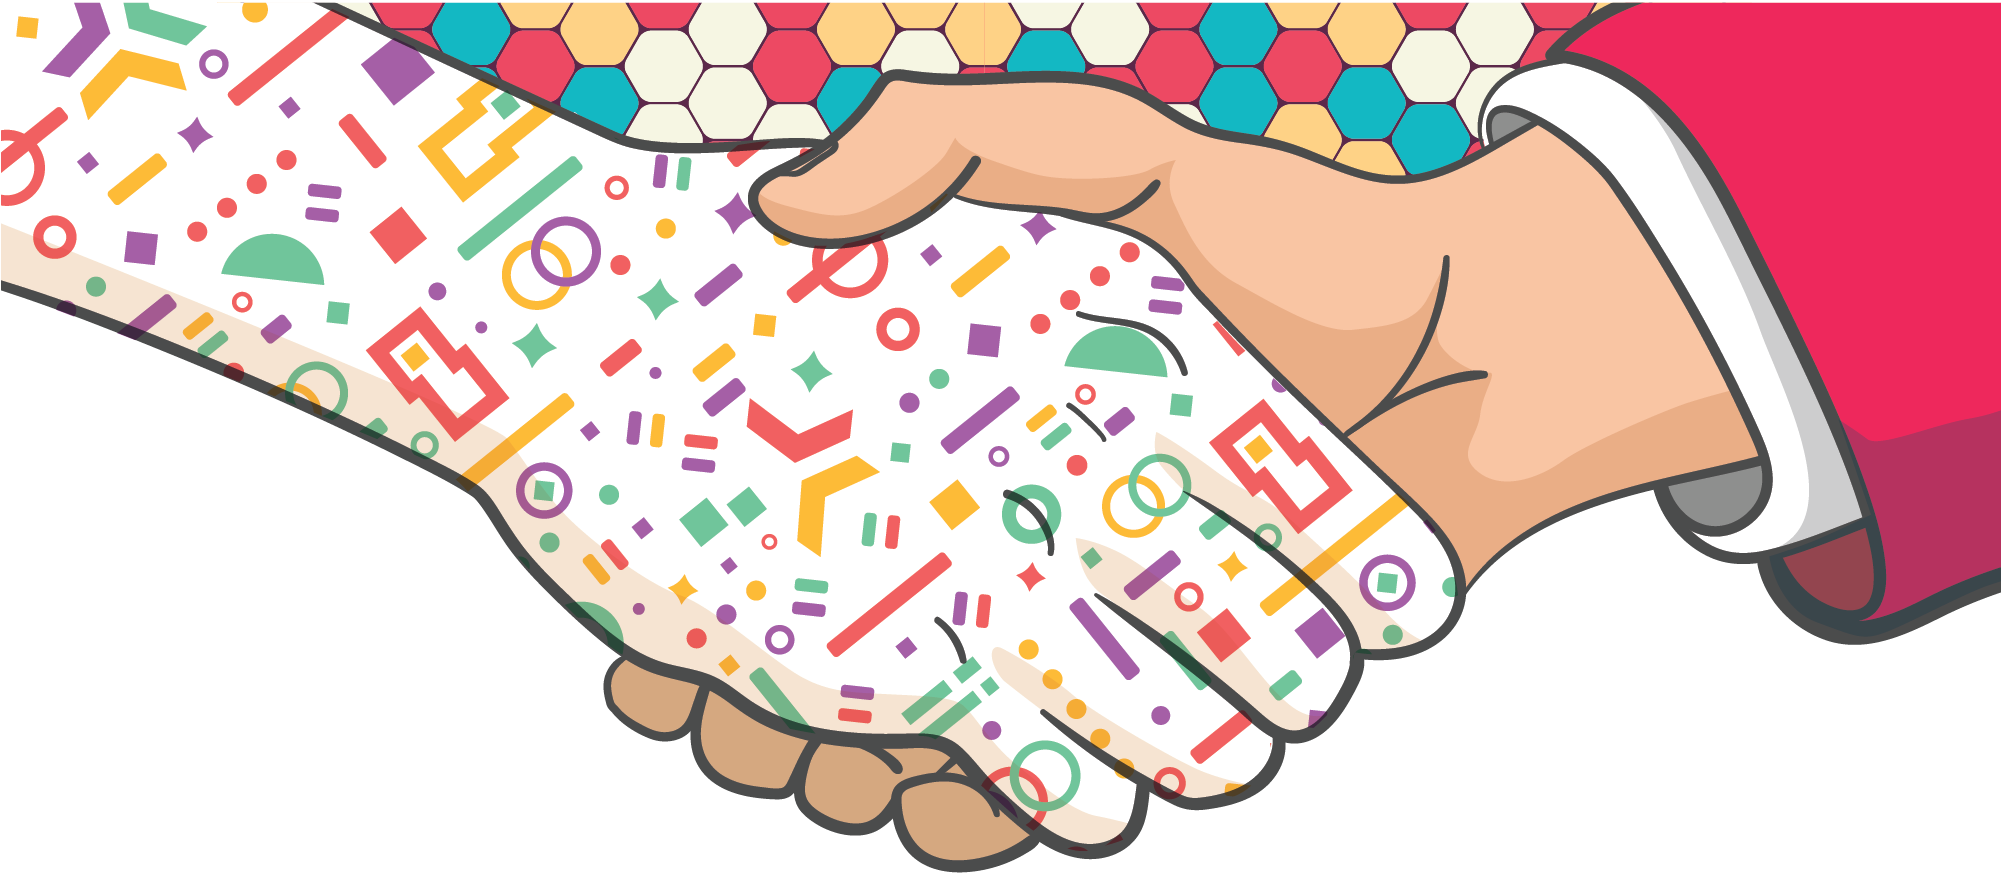 Brand-Relationships-Handshake